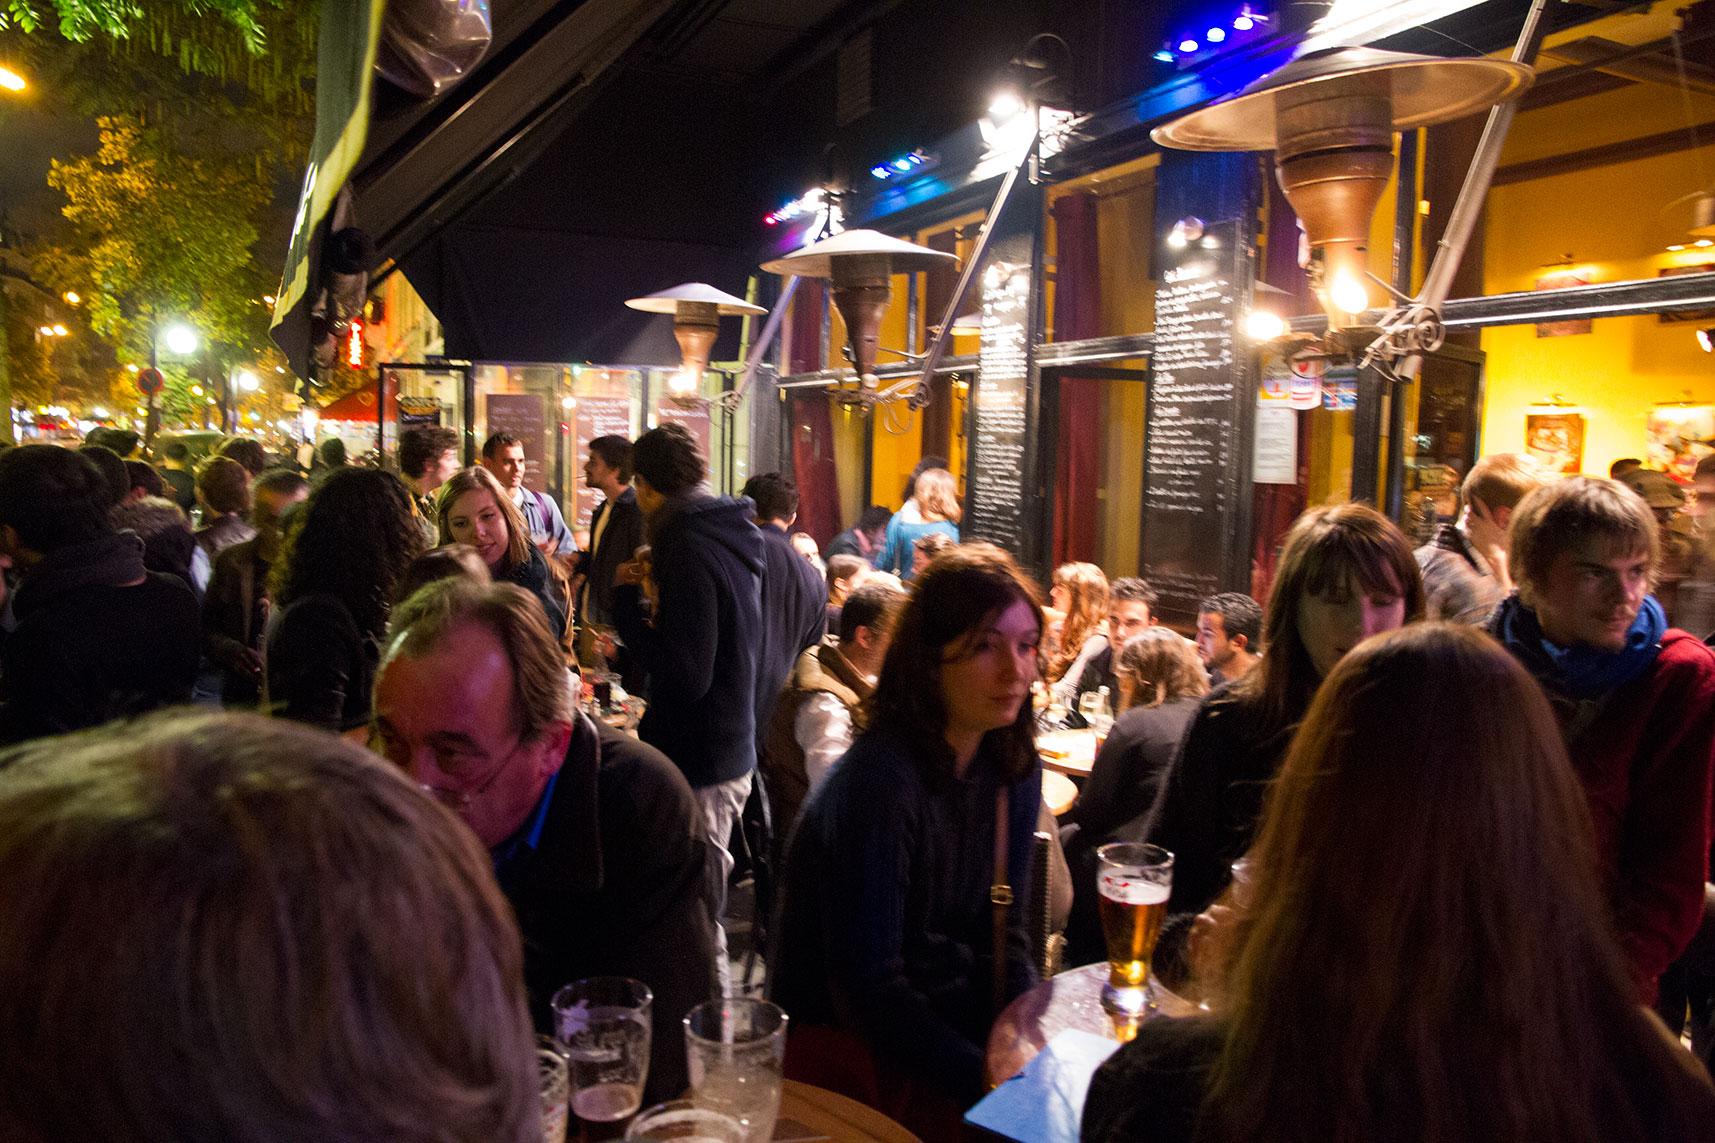 bataclan-cafe-image-brasserie-paris